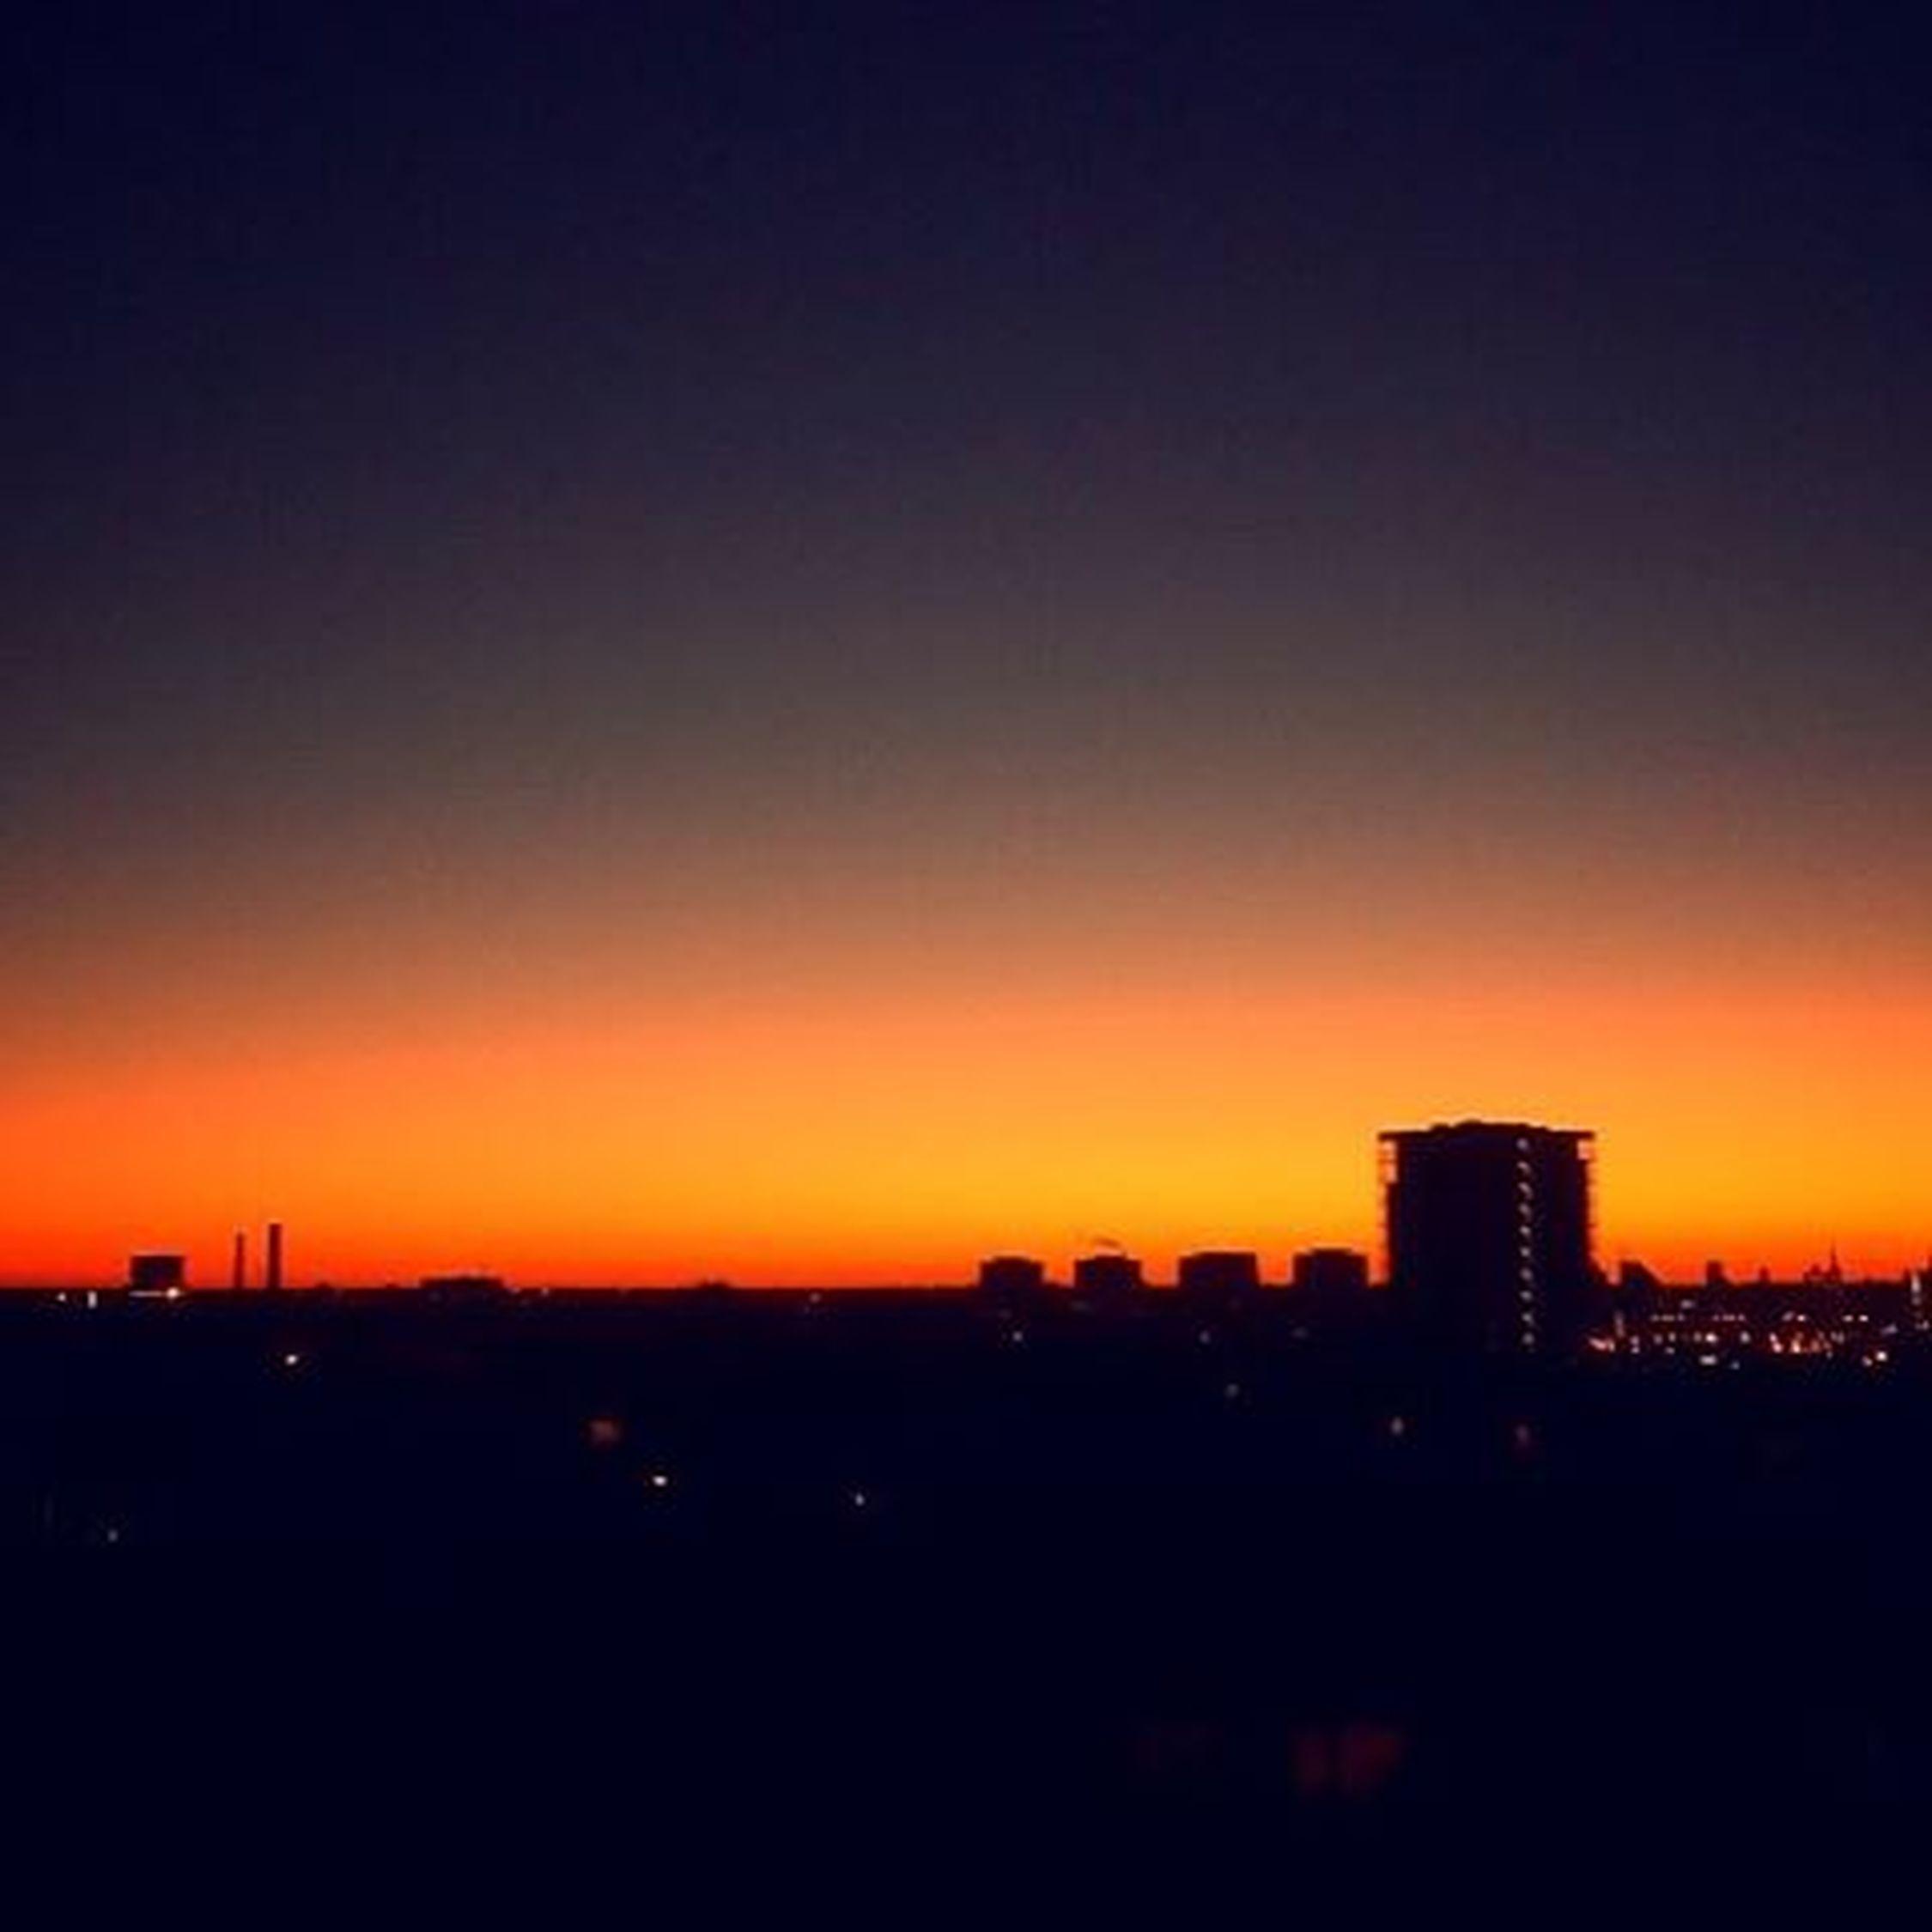 🌆👌 Sunset Tallinn City Orange Photographer Wannabe Manyhashtags Pretty Awesome Sky AnotherHashtag Inspiration Apartmentbuilding Citylights Like4like Beginner PhonePhotography Phonephoto Snapchat